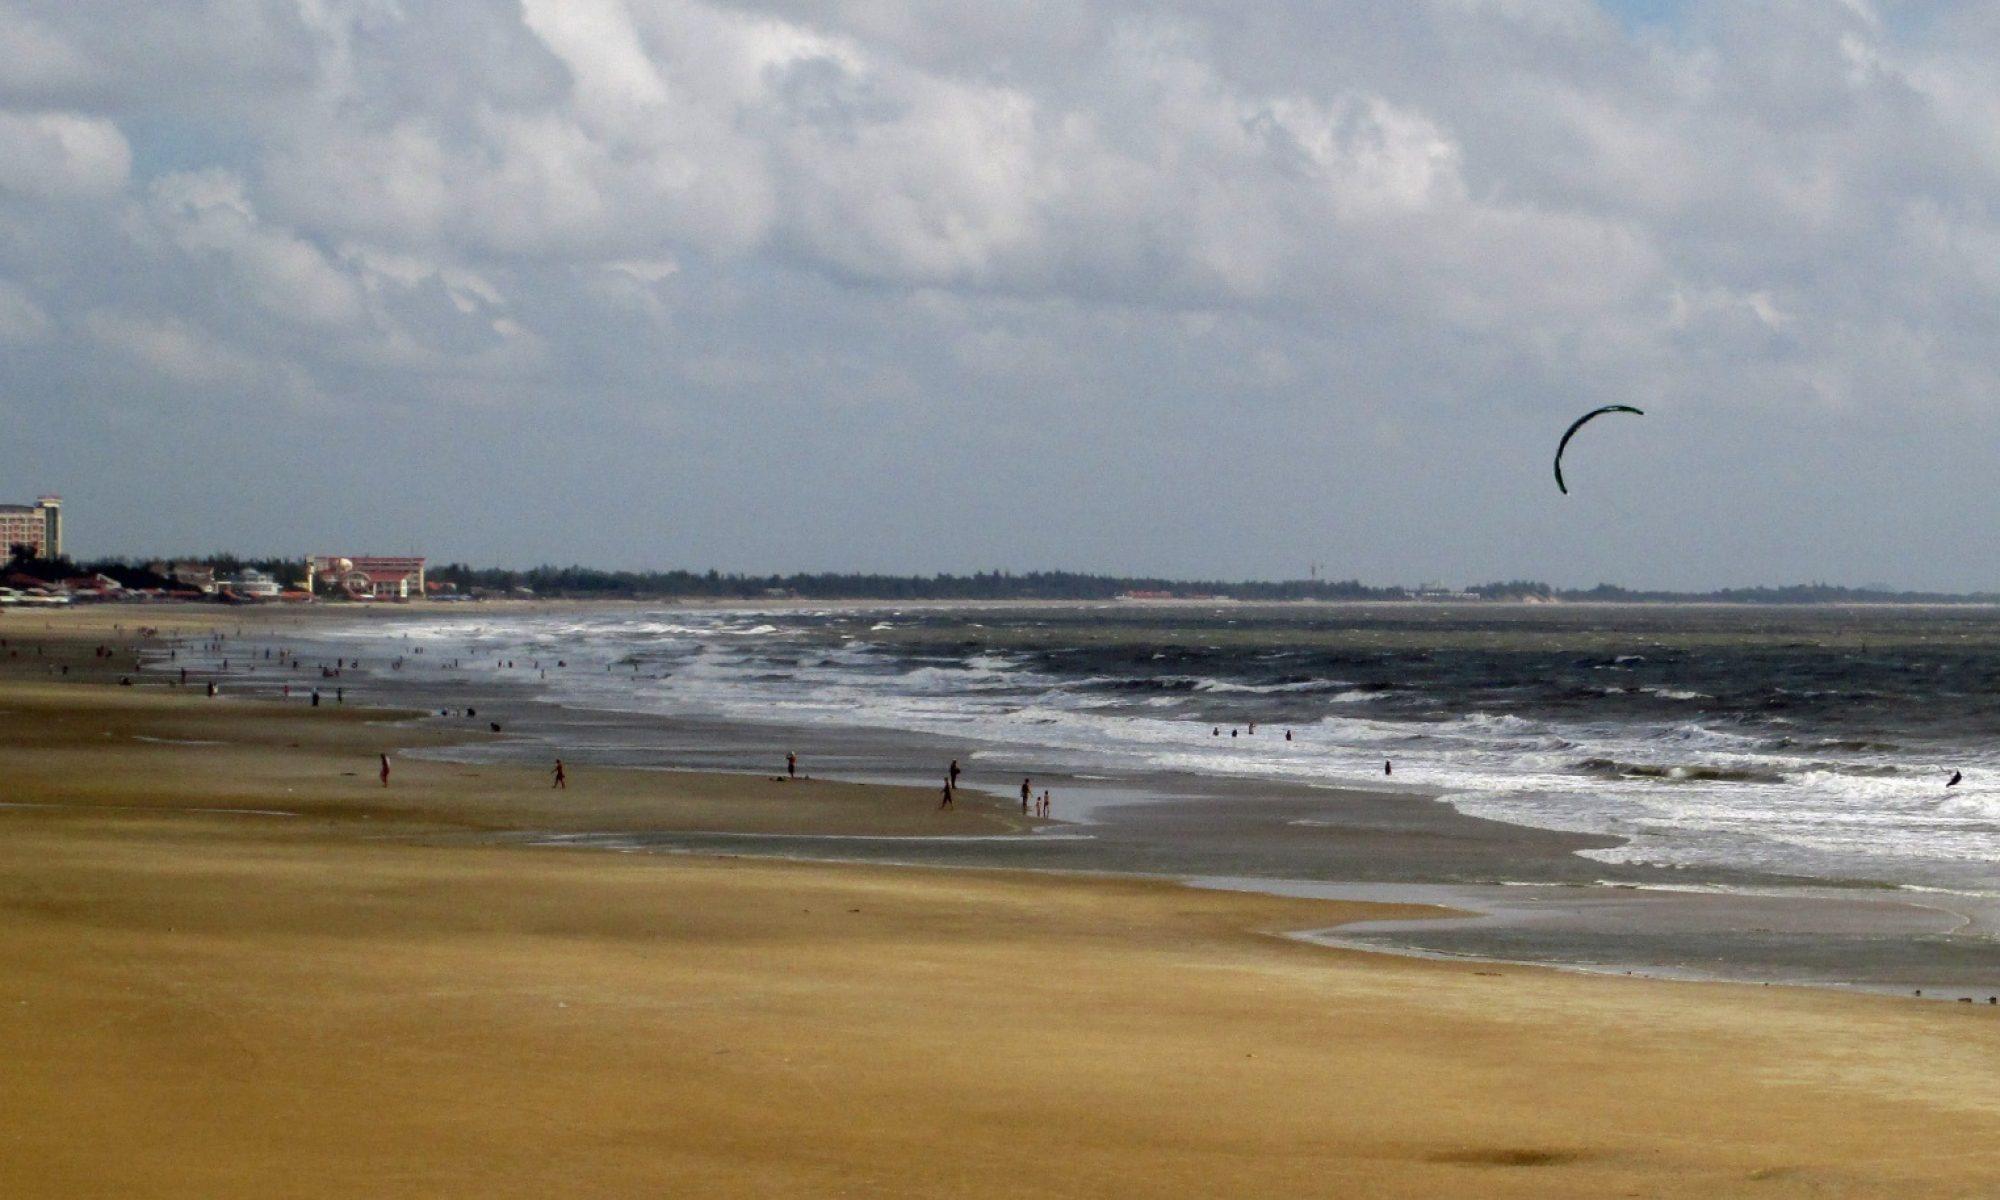 Kitesurfing Lessons Vietnam